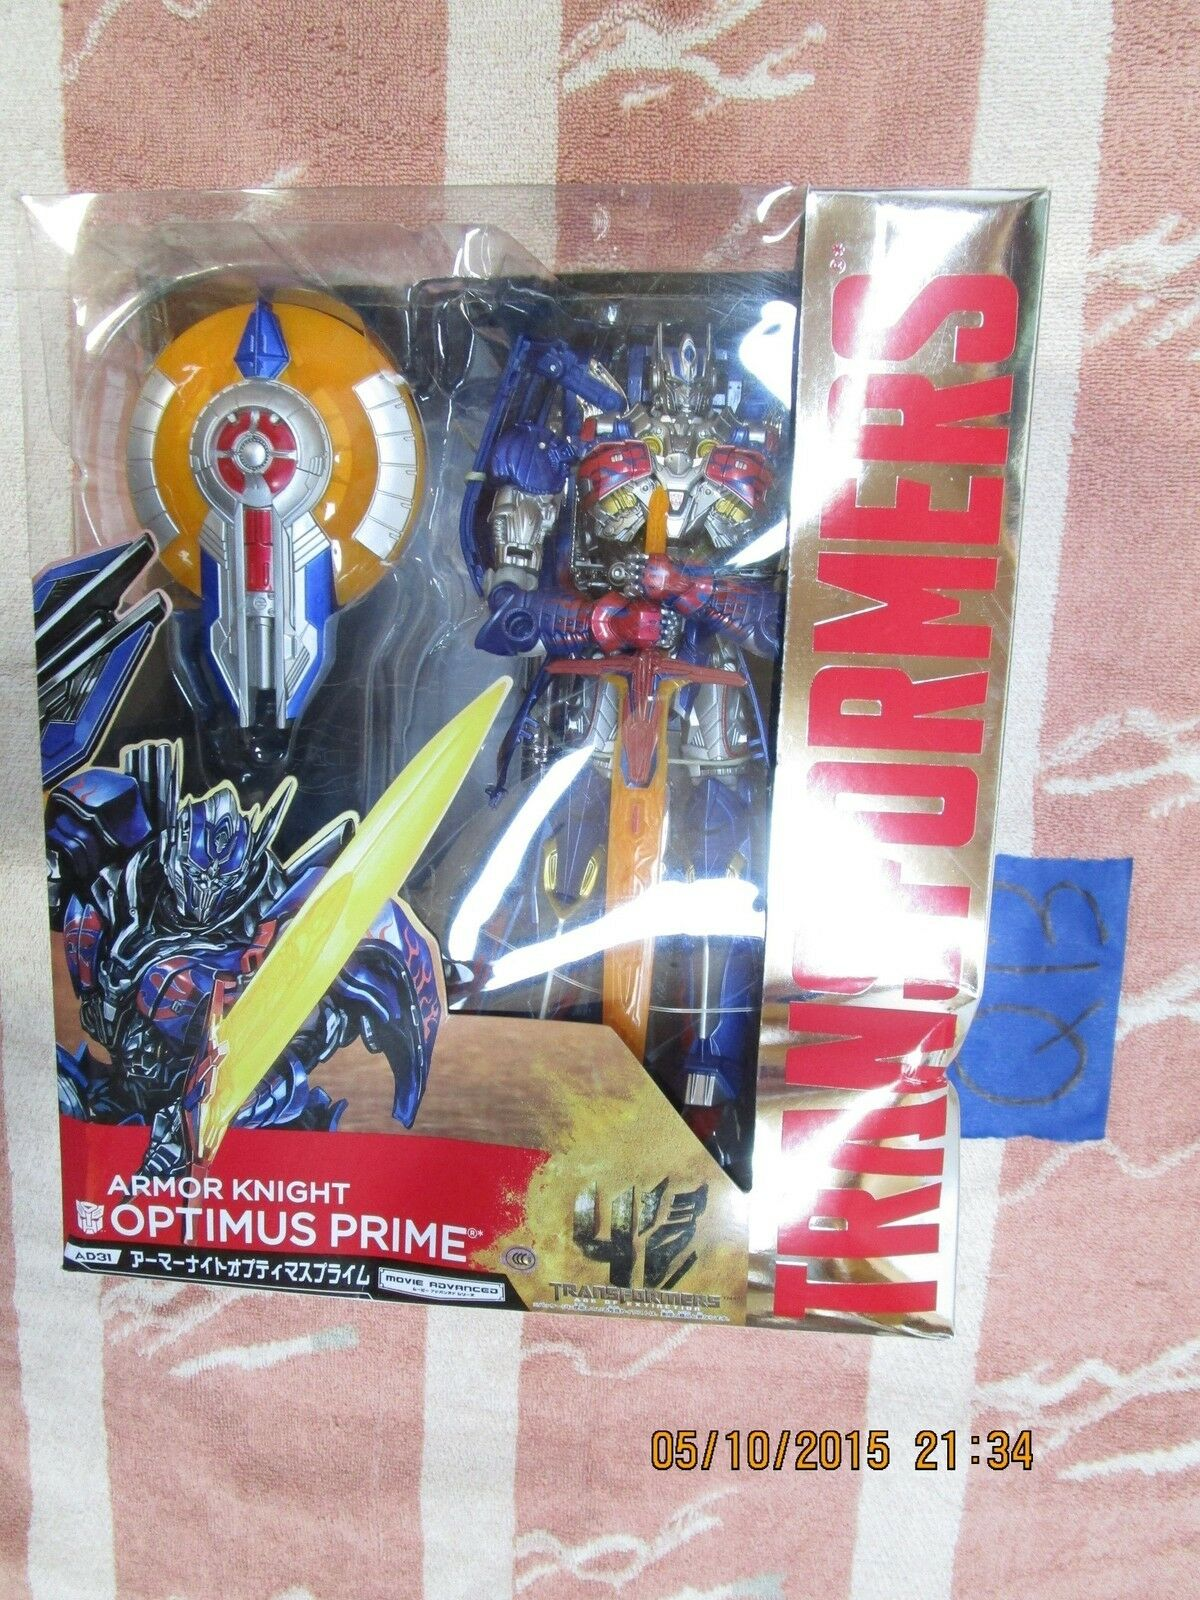 Q13_15 Transformers Lot AD 03 ARMOR KNIGHT OPTIMUS  PRIME  2 Movie Advanced AOE  offerta speciale